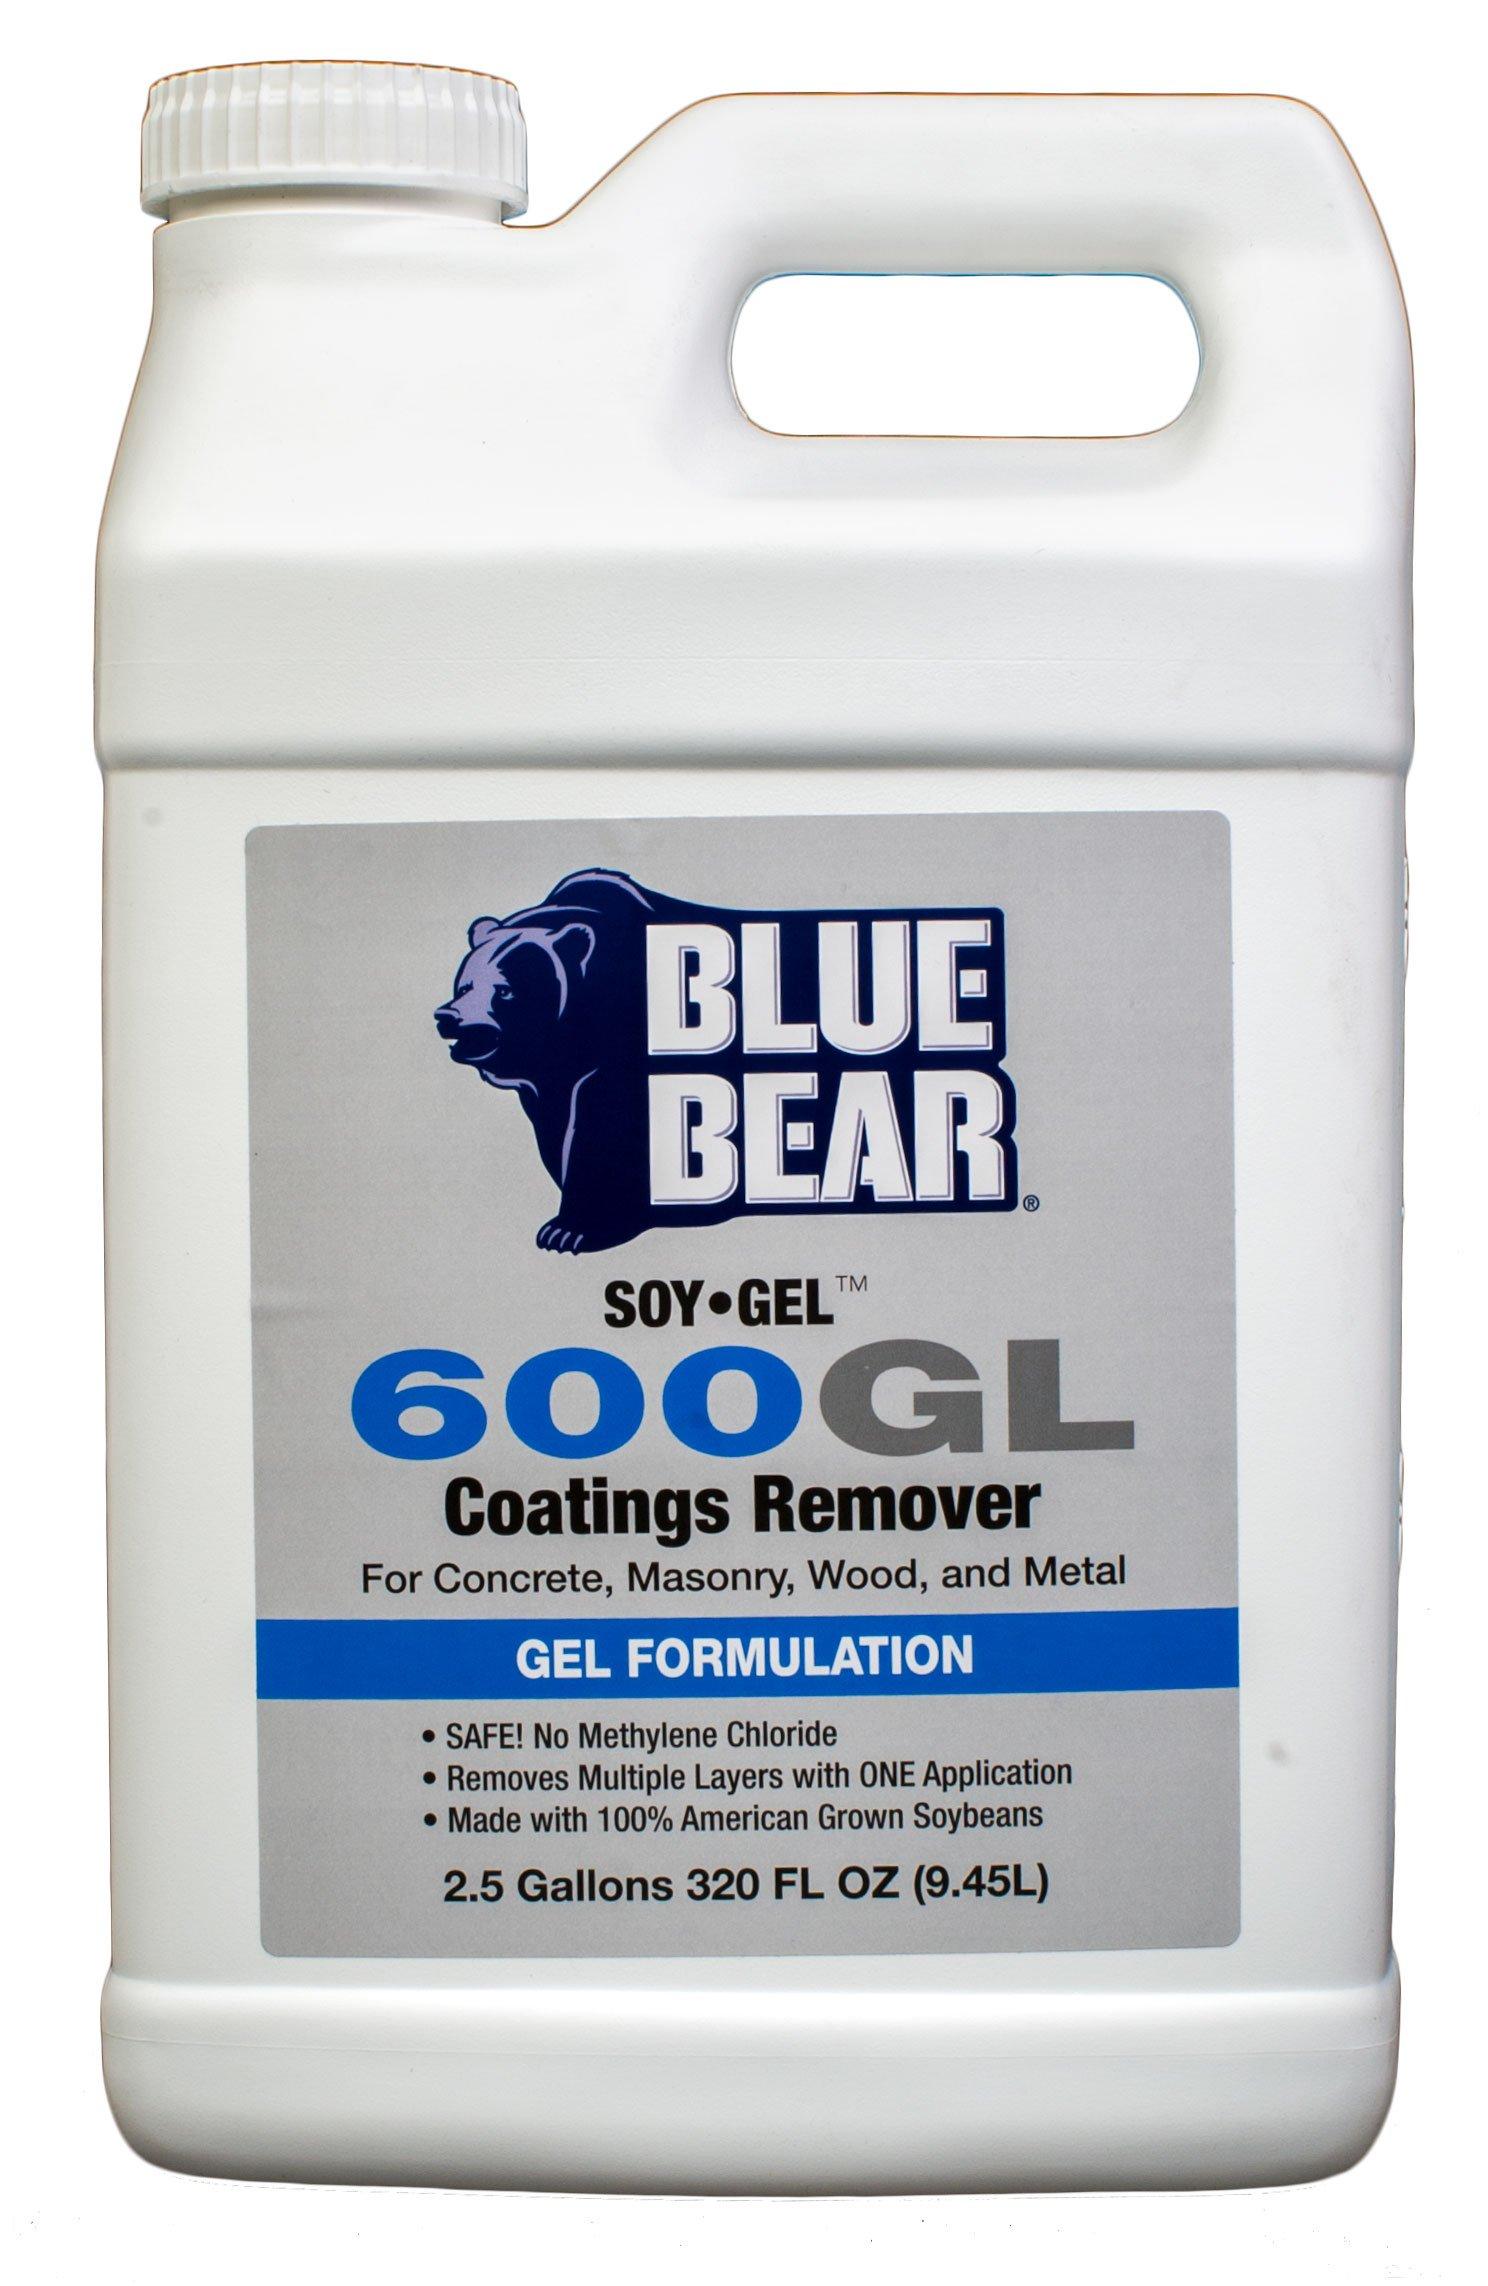 BLUE BEAR 600GL Coatings Remover 2.5 Gallon